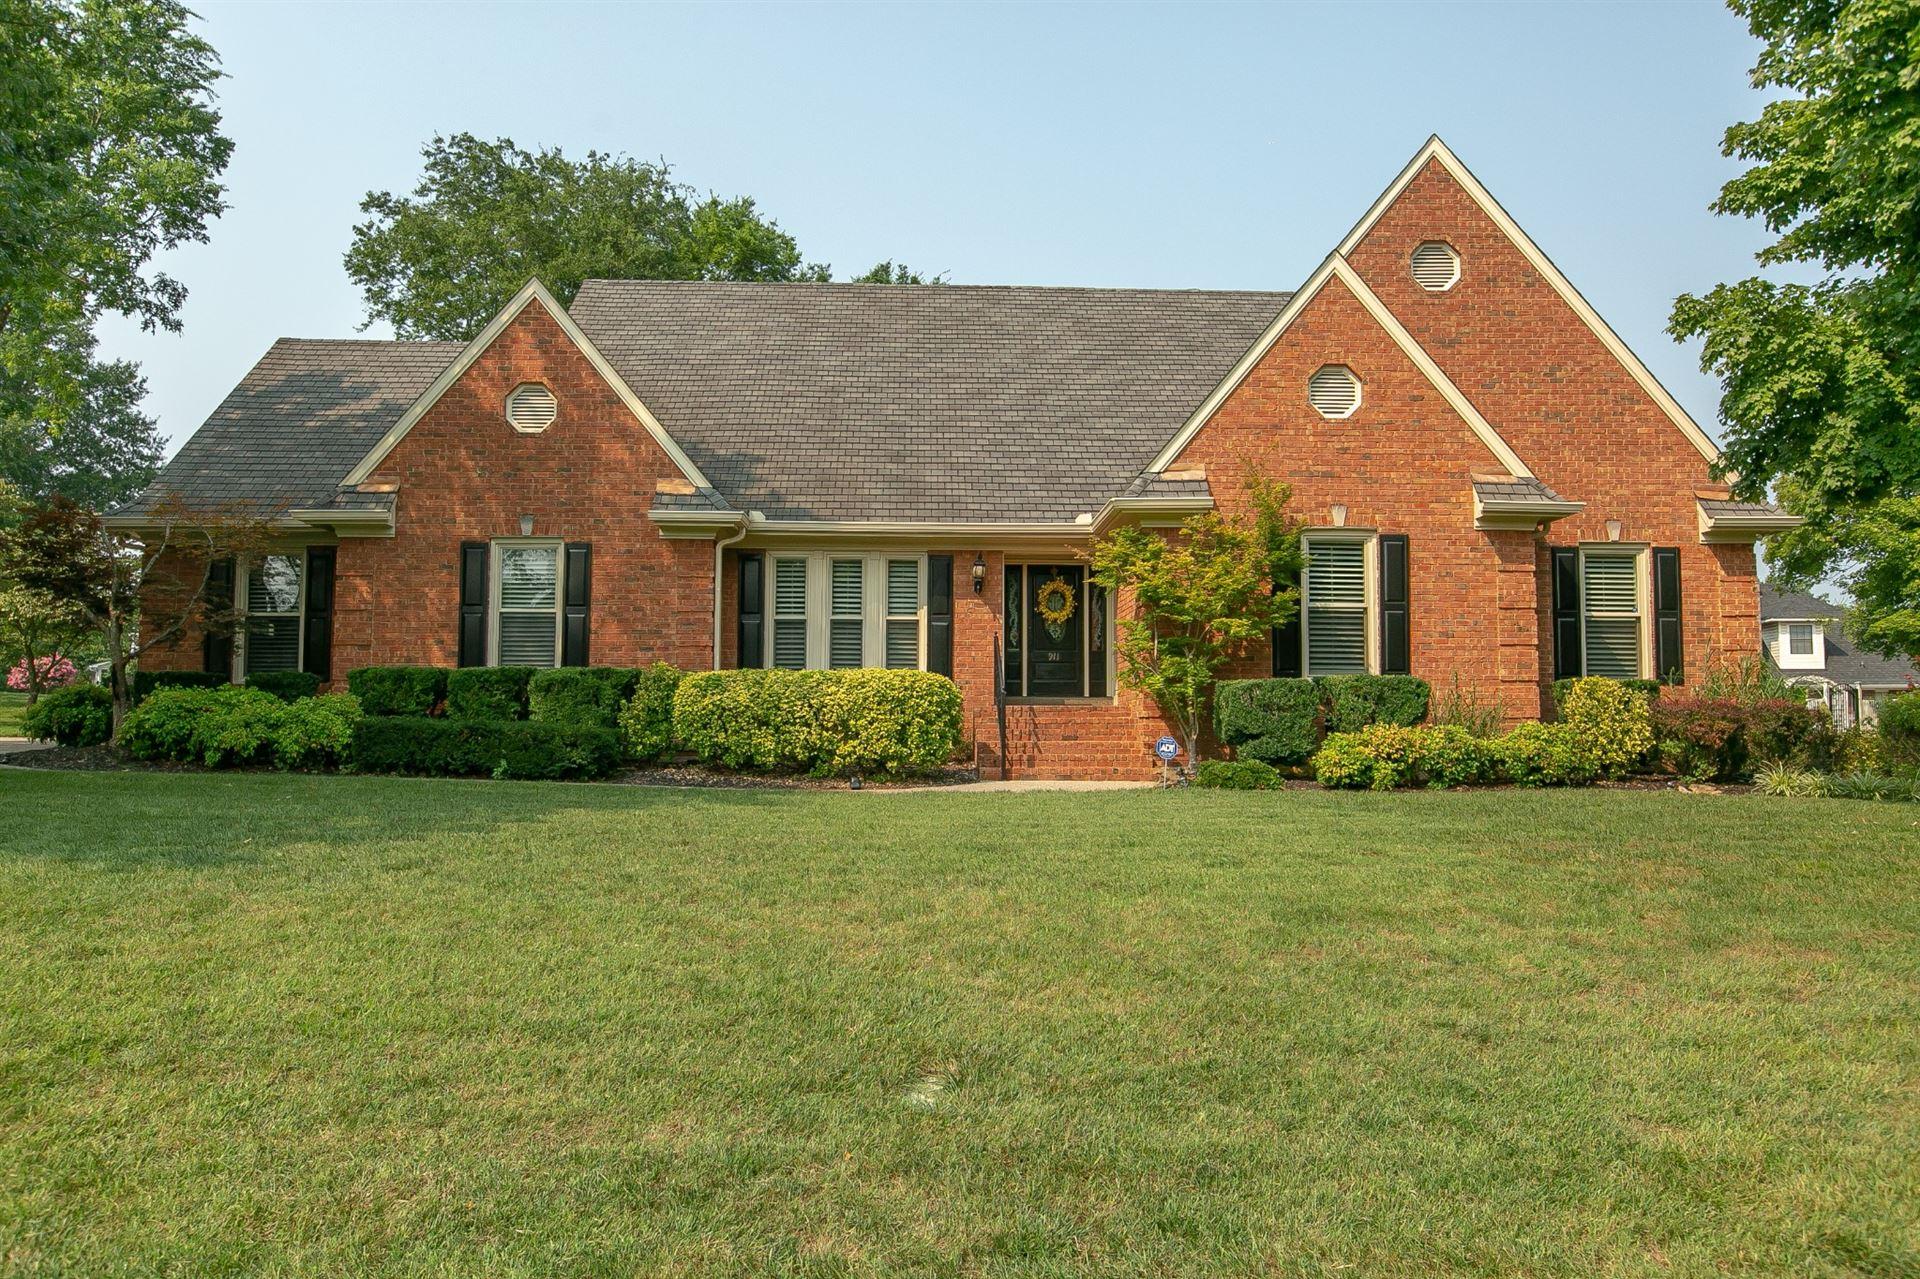 911 Scepter Drive, Murfreesboro, TN 37129 - MLS#: 2275412